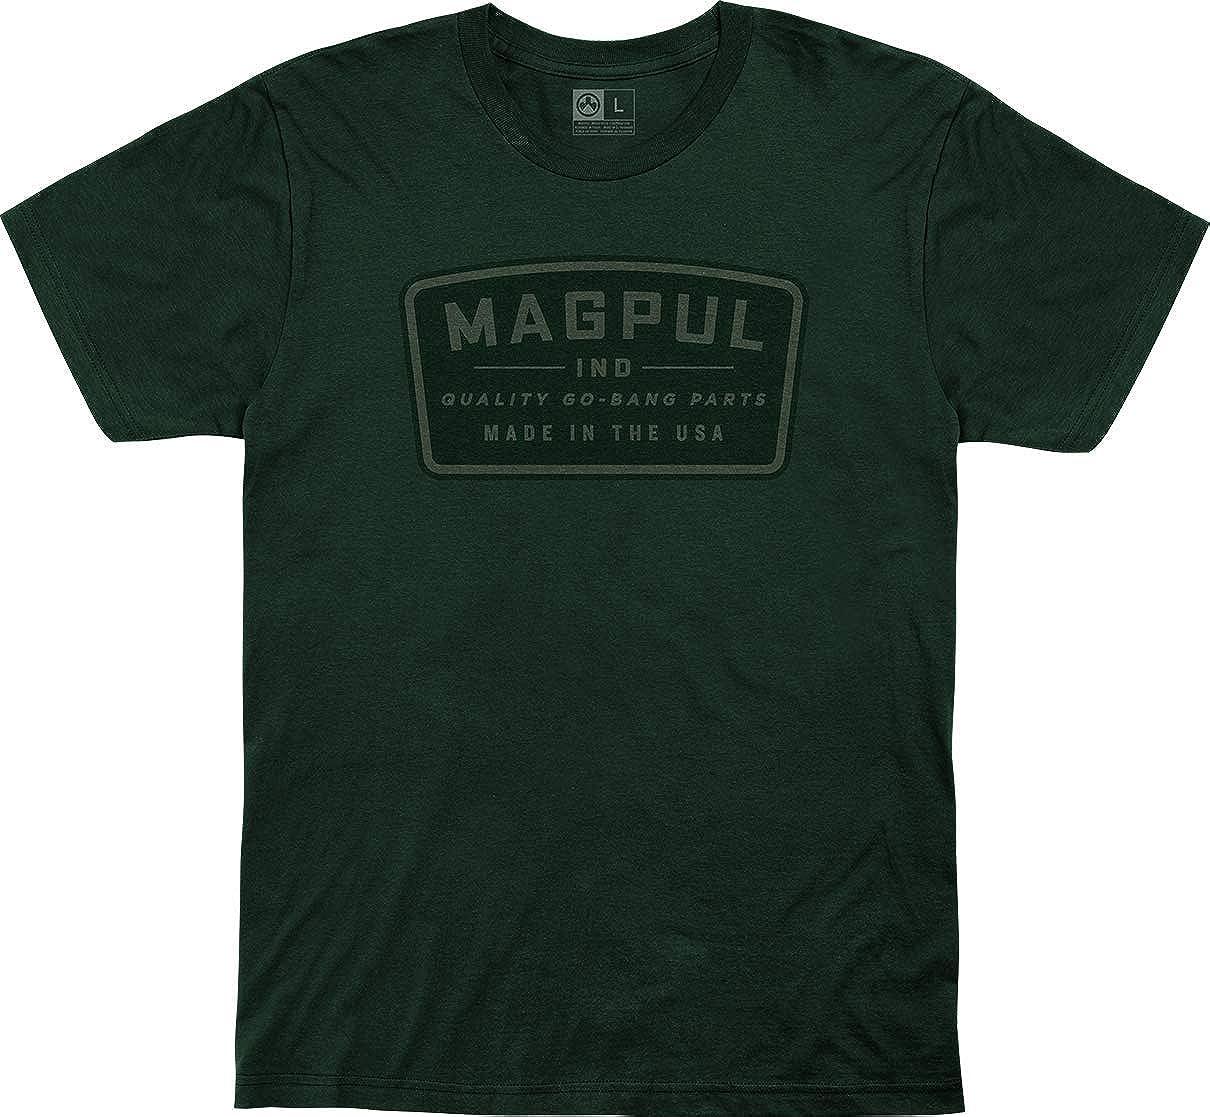 Magpul Men's Standard Mapgul Cotton Crew Neck T-Shirt